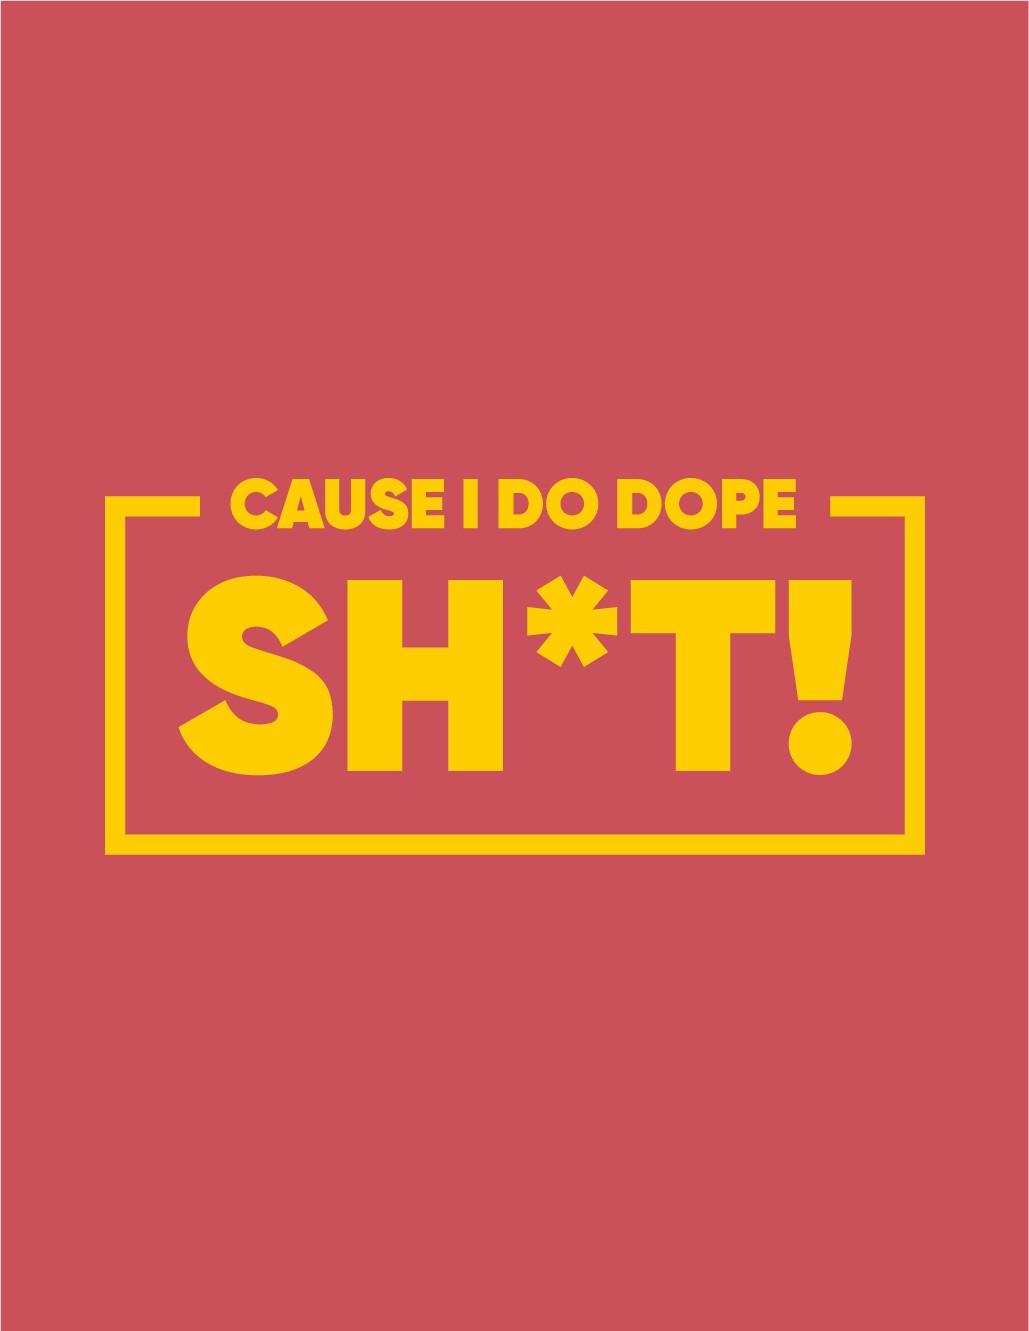 Dope Tshirt Quote Design for Kick Ass Entrepreneurs!